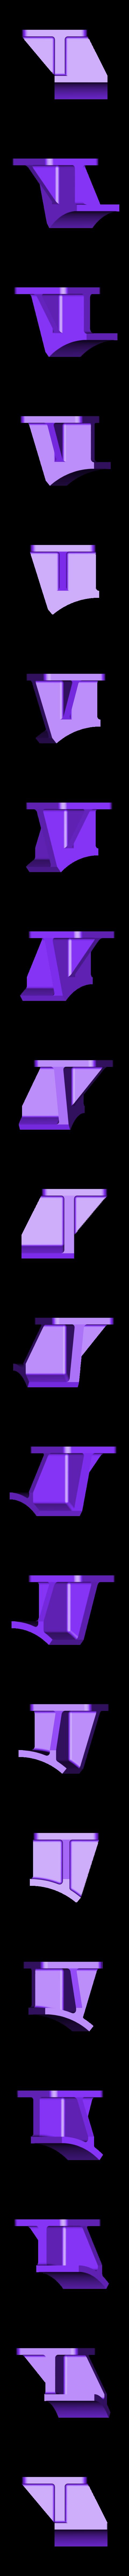 MirrorFront_Step_Bracket_Seat_Right.STL Download free STL file 4-8-8-4 Big Boy Locomotive • 3D printer object, RaymondDeLuca